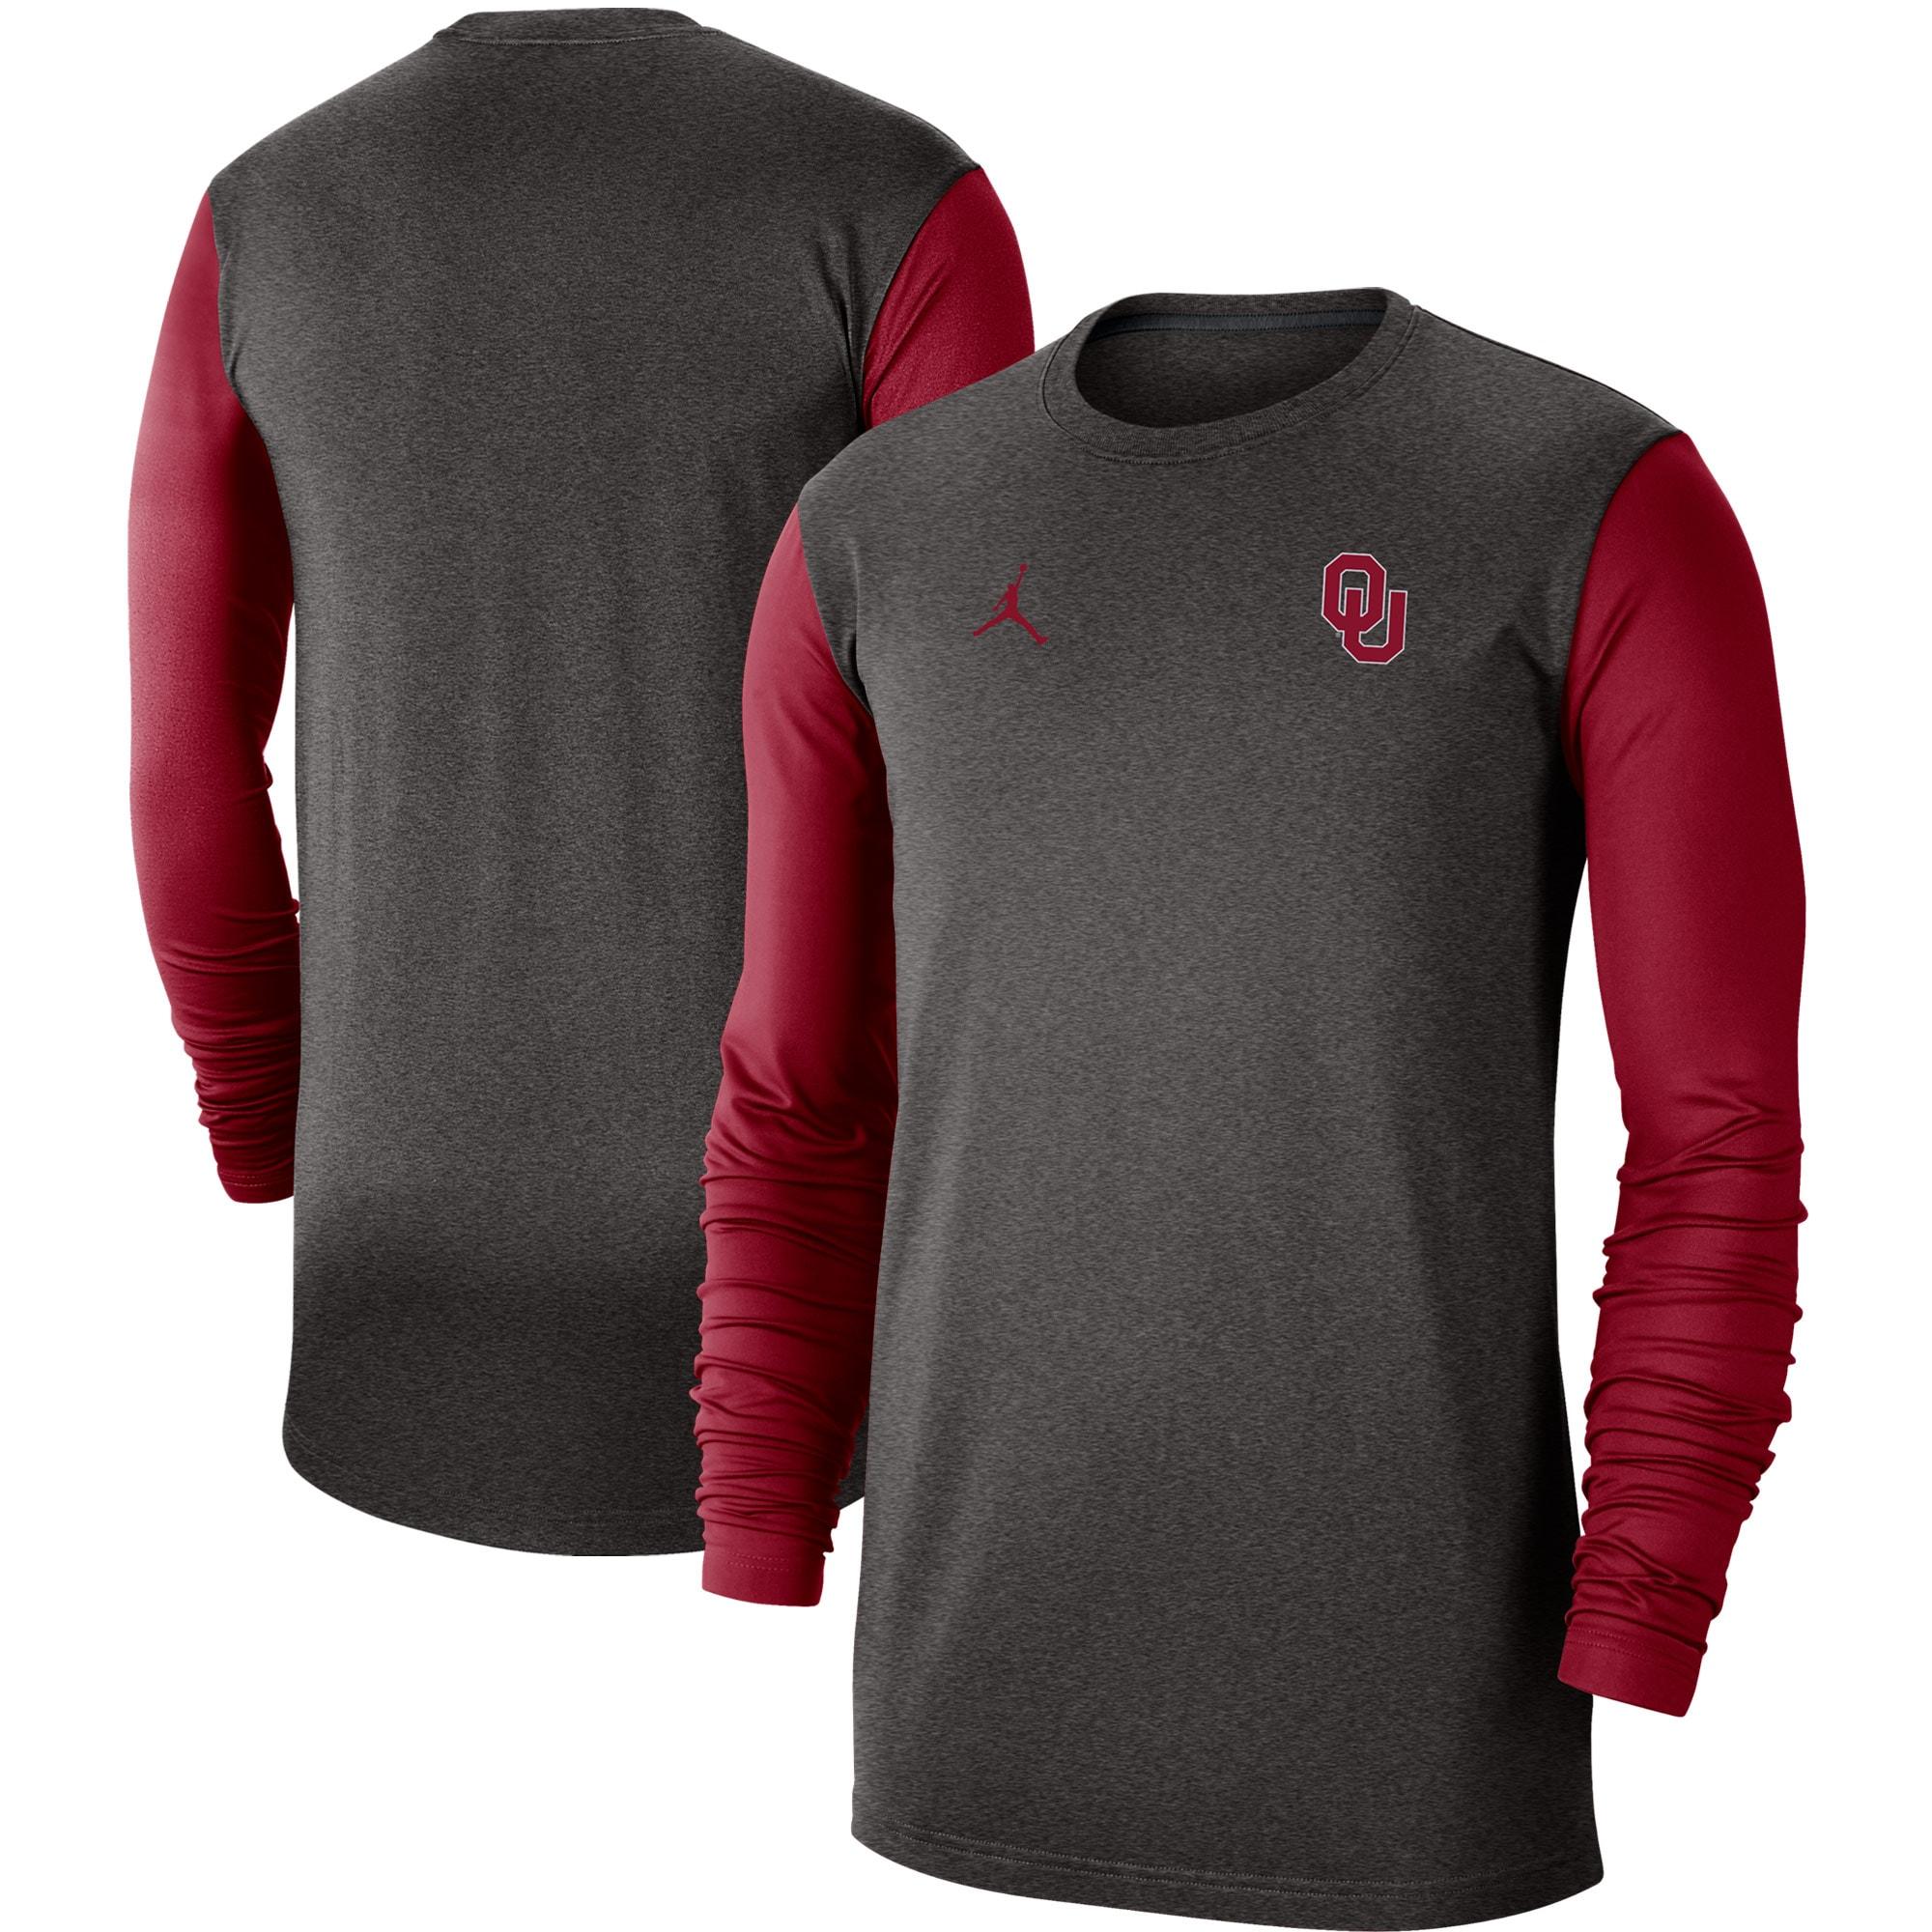 Oklahoma Sooners Jordan Brand Performance Long Sleeve T-Shirt - Heathered Gray/Crimson